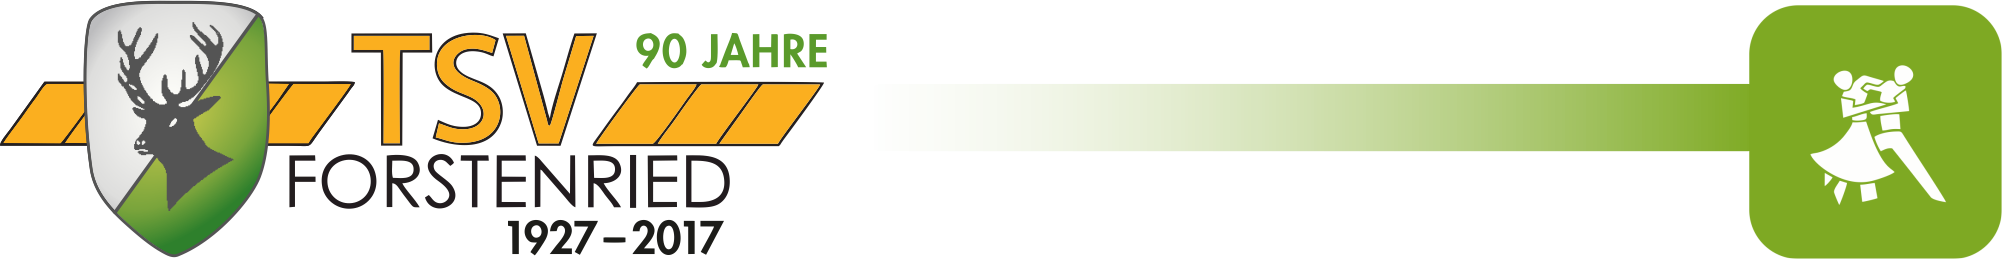 Tanzen im TSV Forstenried Logo